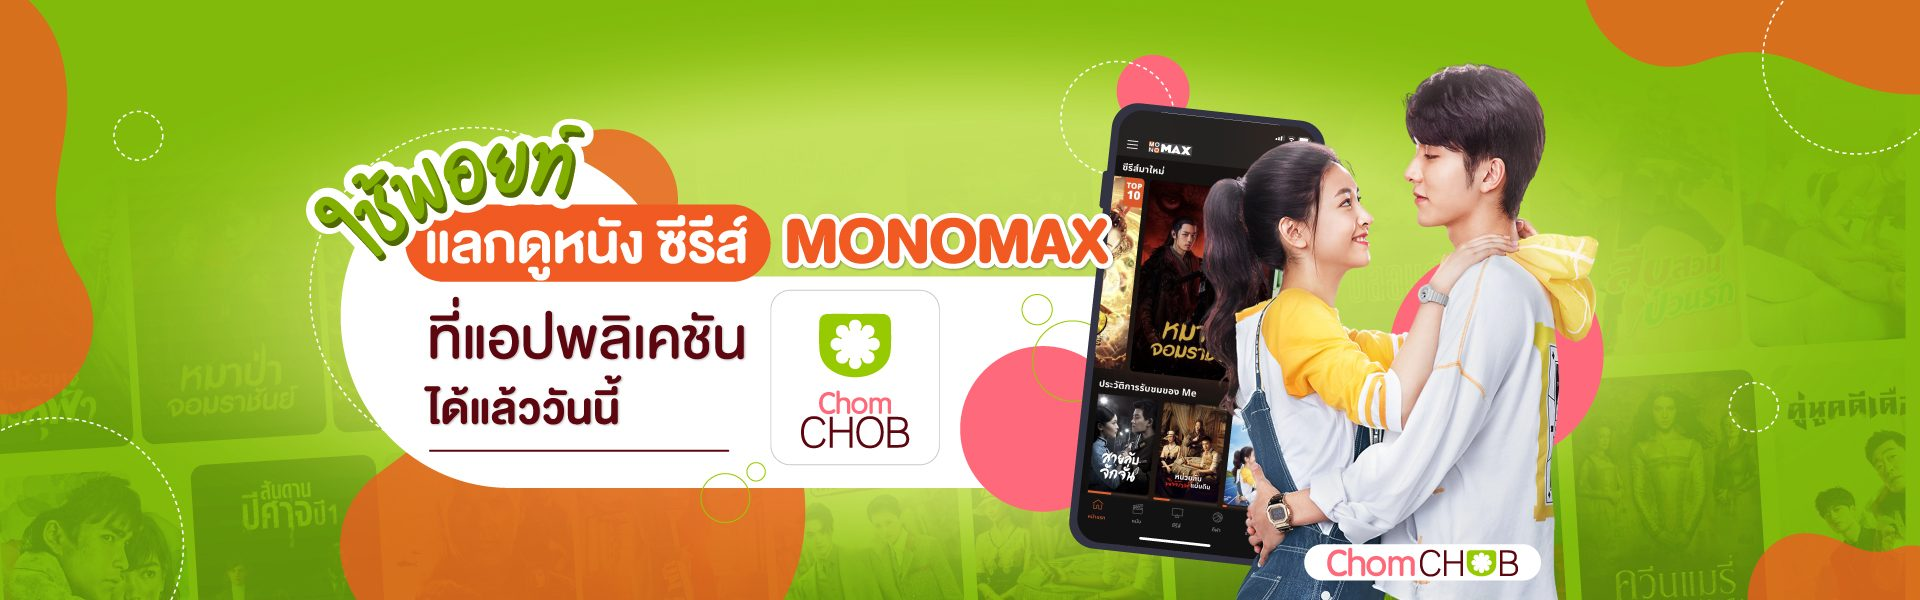 MONOMAX ร่วมกับ Application ChomCHOB